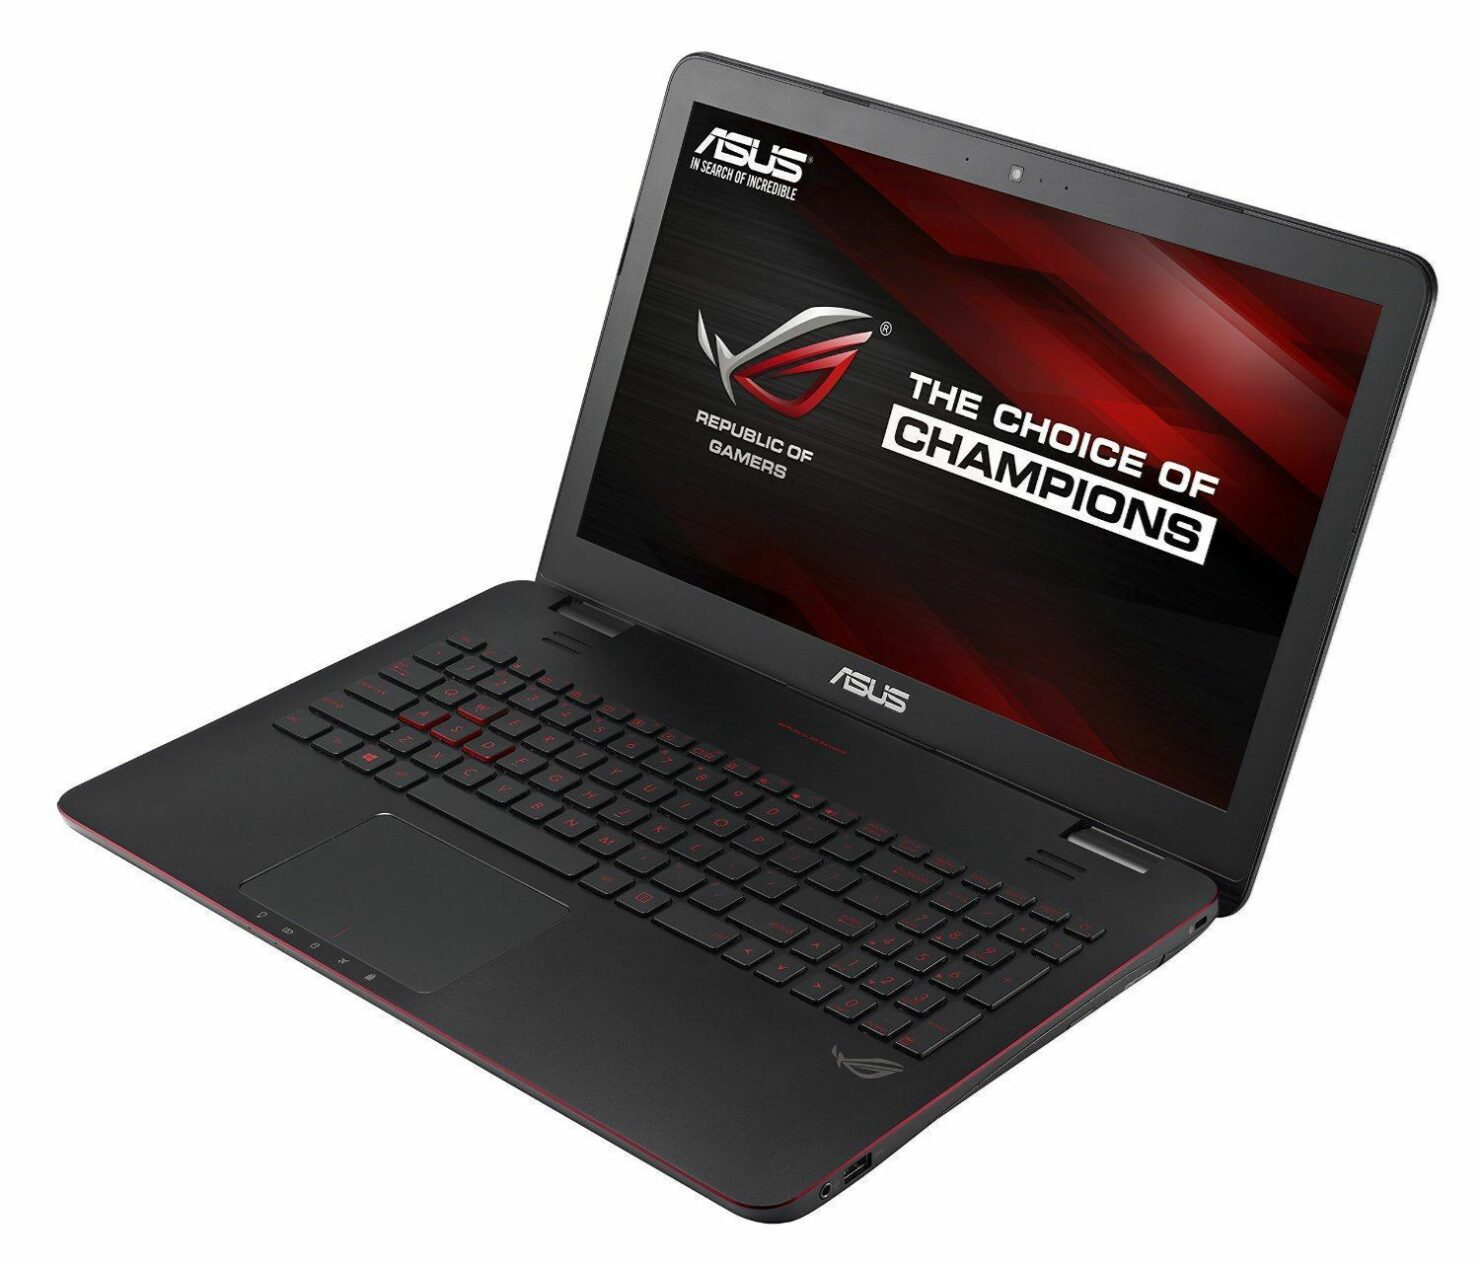 0018884_asus-rog-g551jw-dm022h-i7-4720hq-156-full-hd-gaming-notebook-backpack-mouse-headset